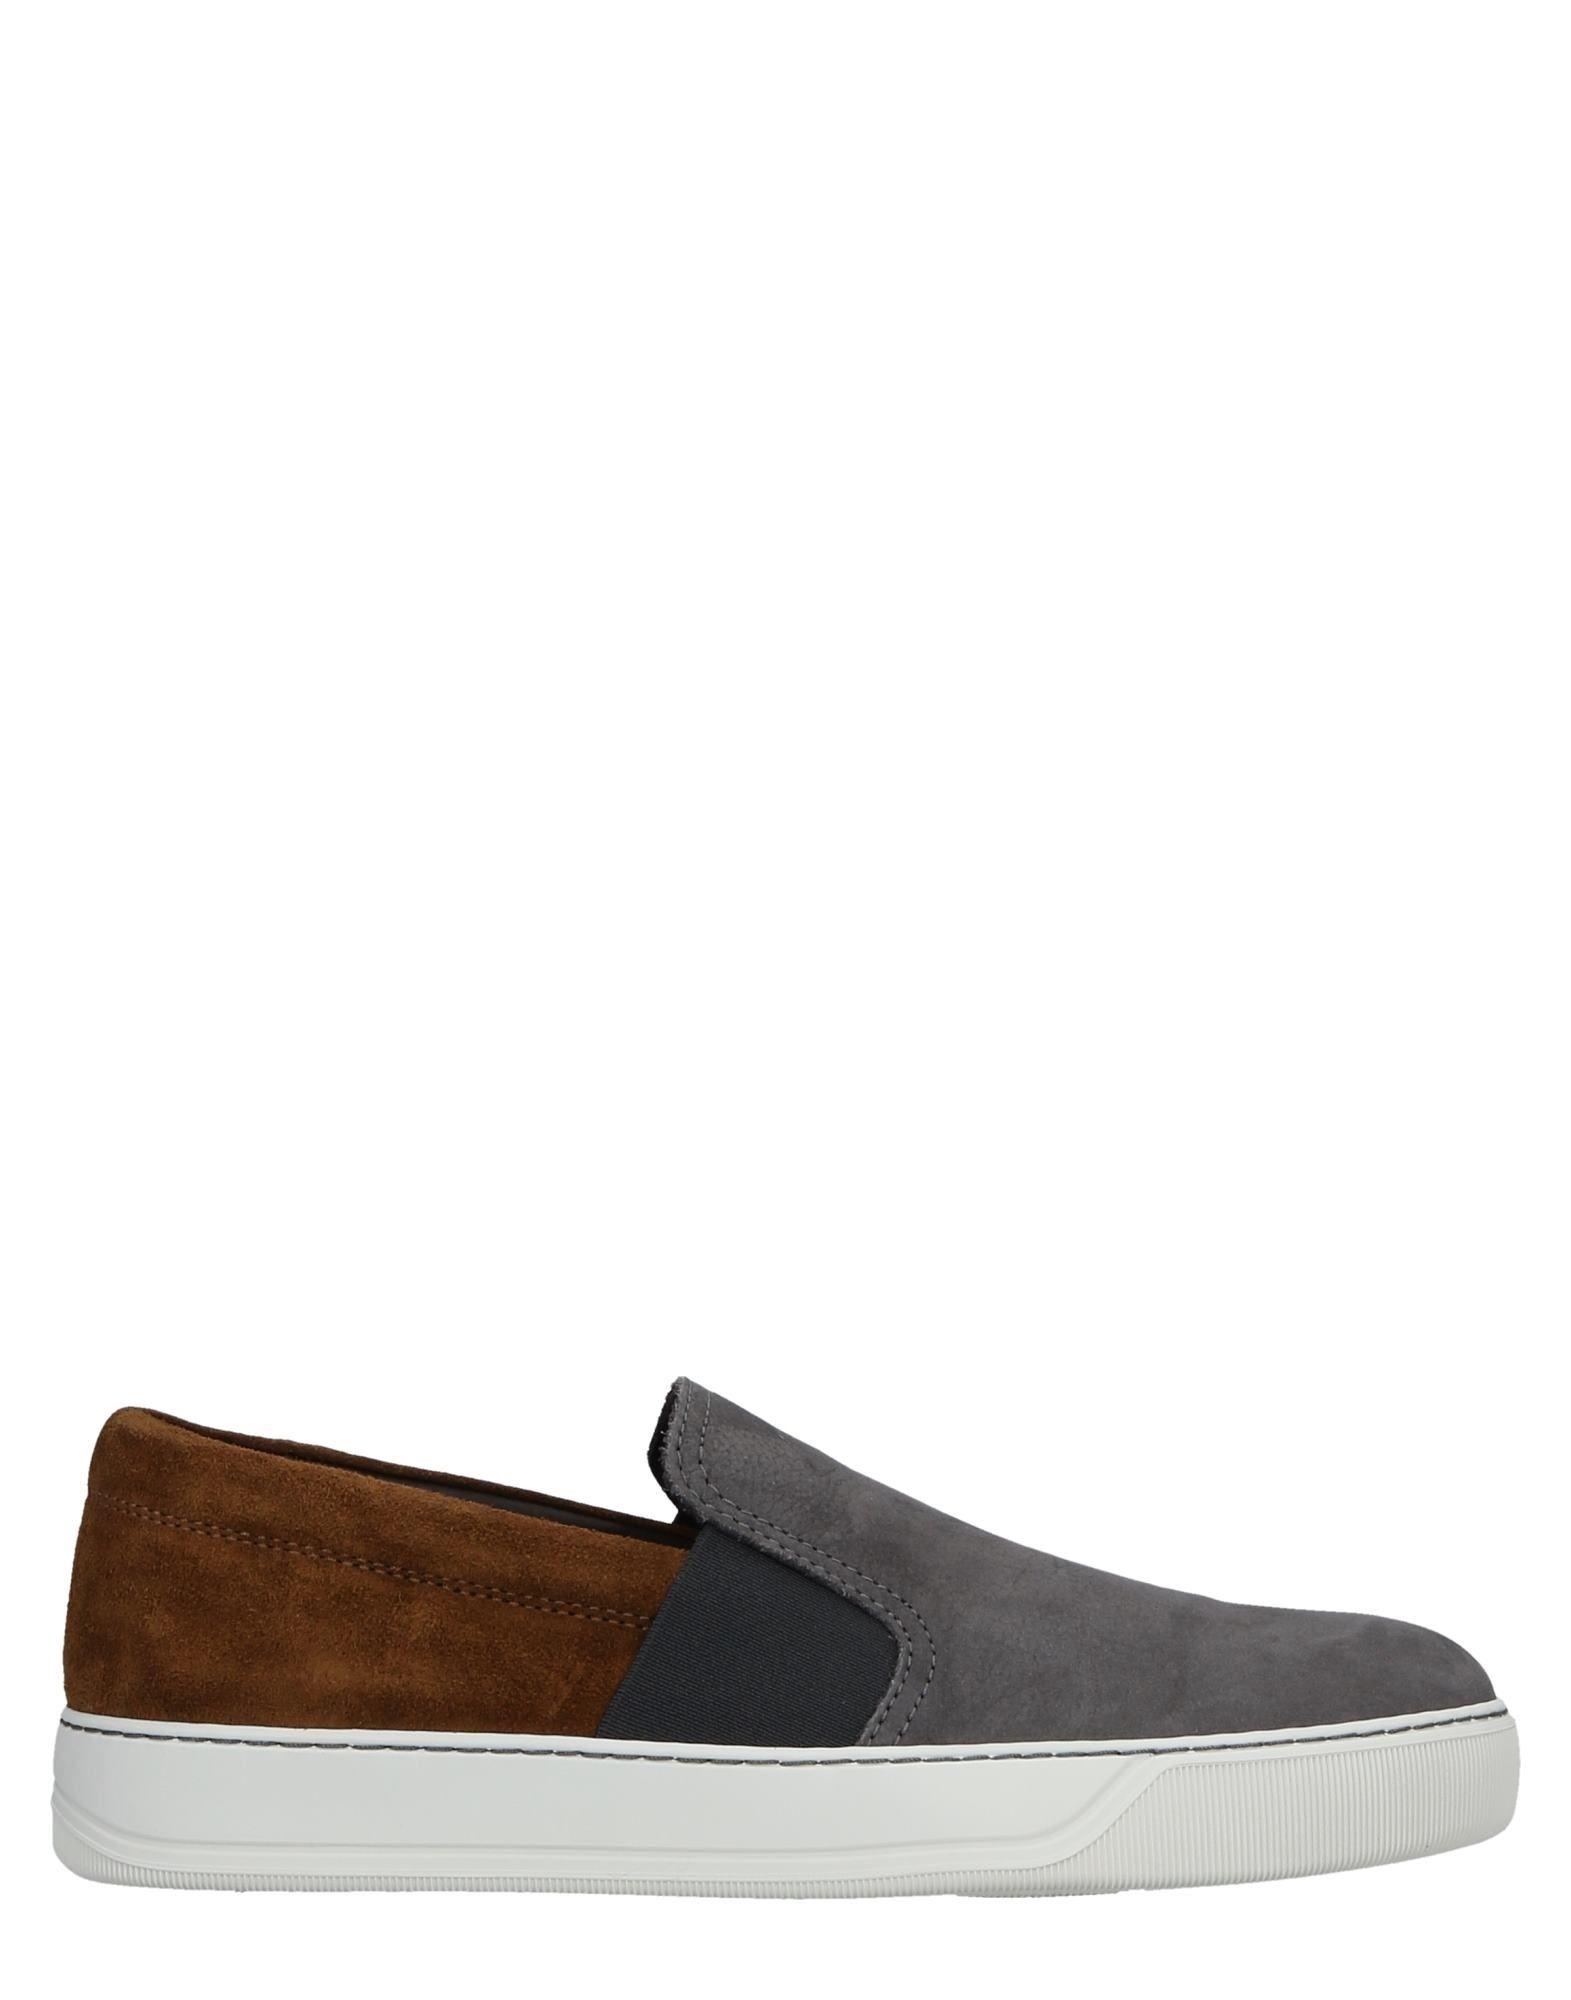 Moda Sneakers Lanvin Uomo - 11514139LG